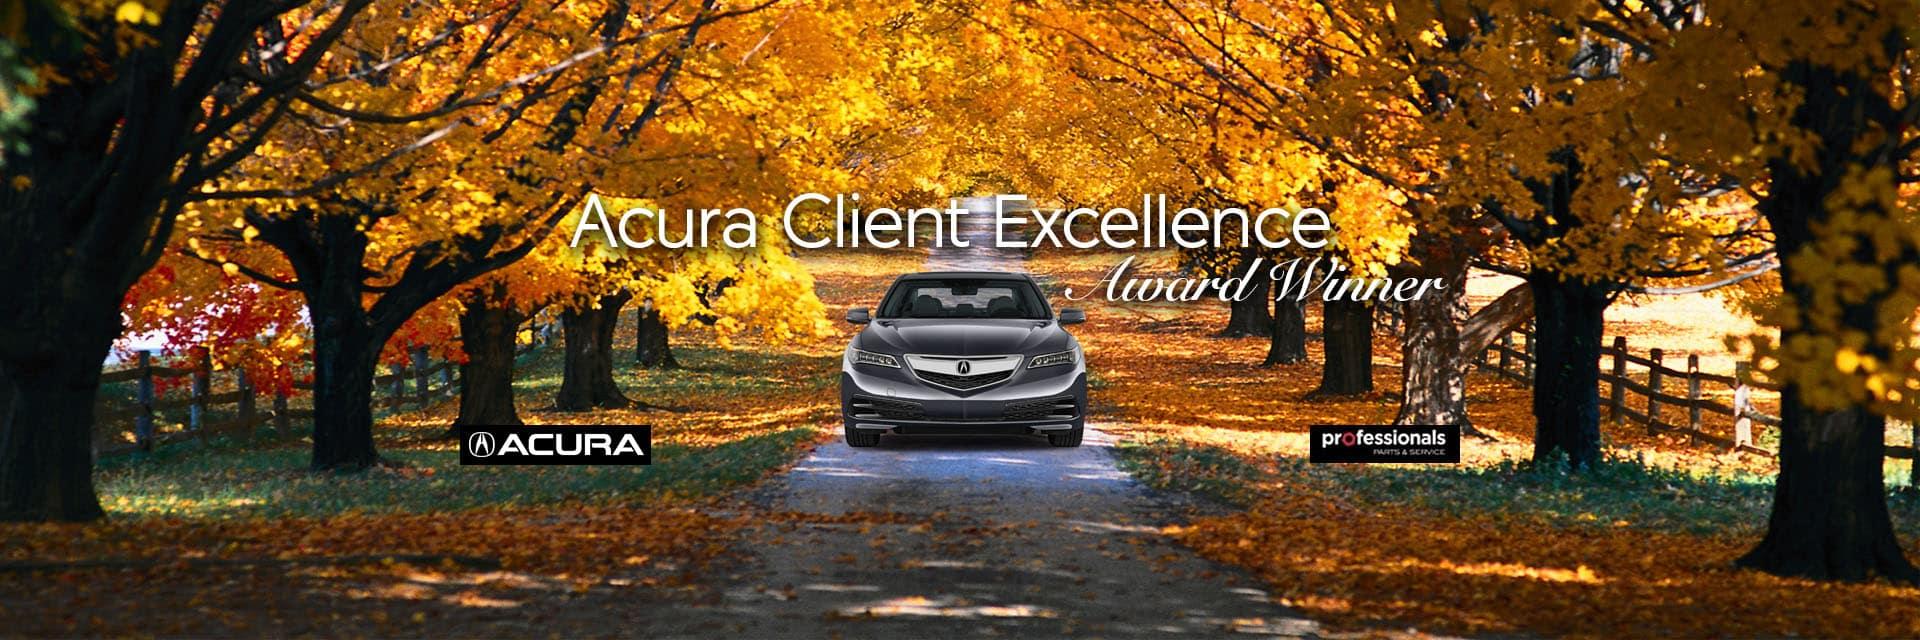 Acura Excellence Award